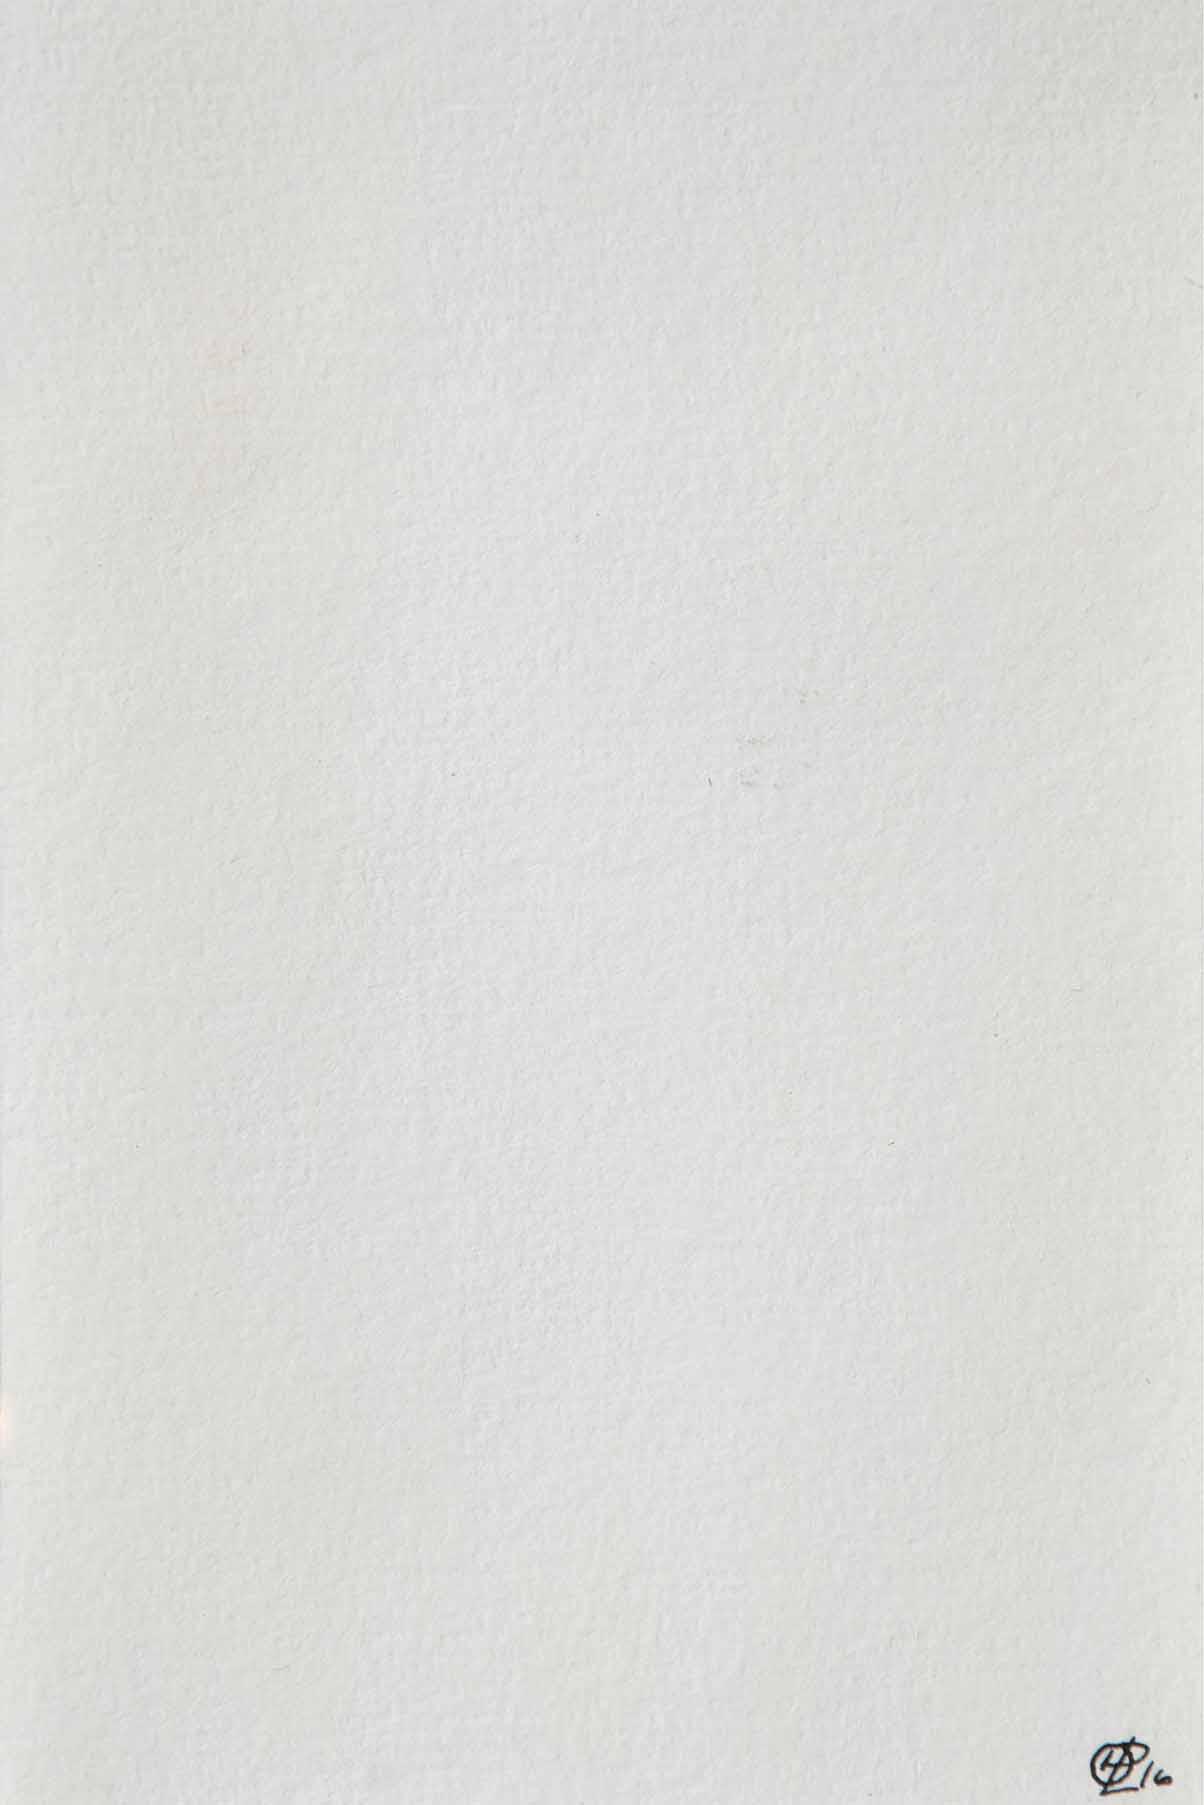 Helene Lundbye Petersen,     Absorbing Beginnings,   2016, Work on Paper, Watercolour, seawater from Greece, paper, 10.5 x 14.8 cm. ( Colour Spectrum of 11 Spaces - Greece Series 1/11)